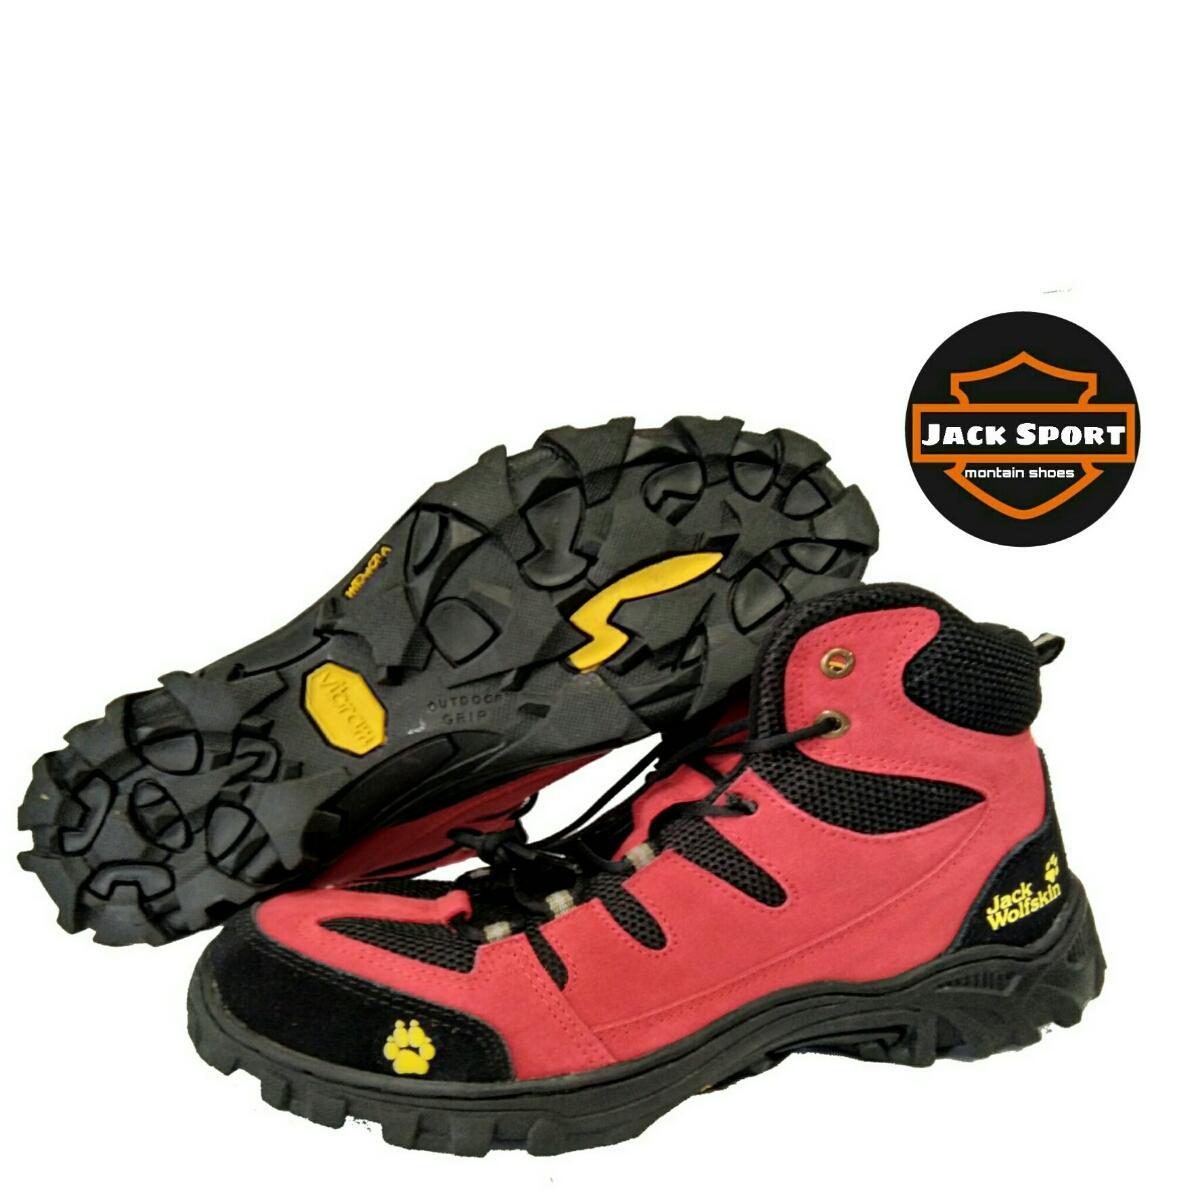 Sepatu Olahraga Outdoor - Sepatu Hiking Pria - Sepatu Jack Wolfskin - Sepatu Tracking - Sepatu Proyek - Sepatu Pendaki Gunung - Waterproof Termurah